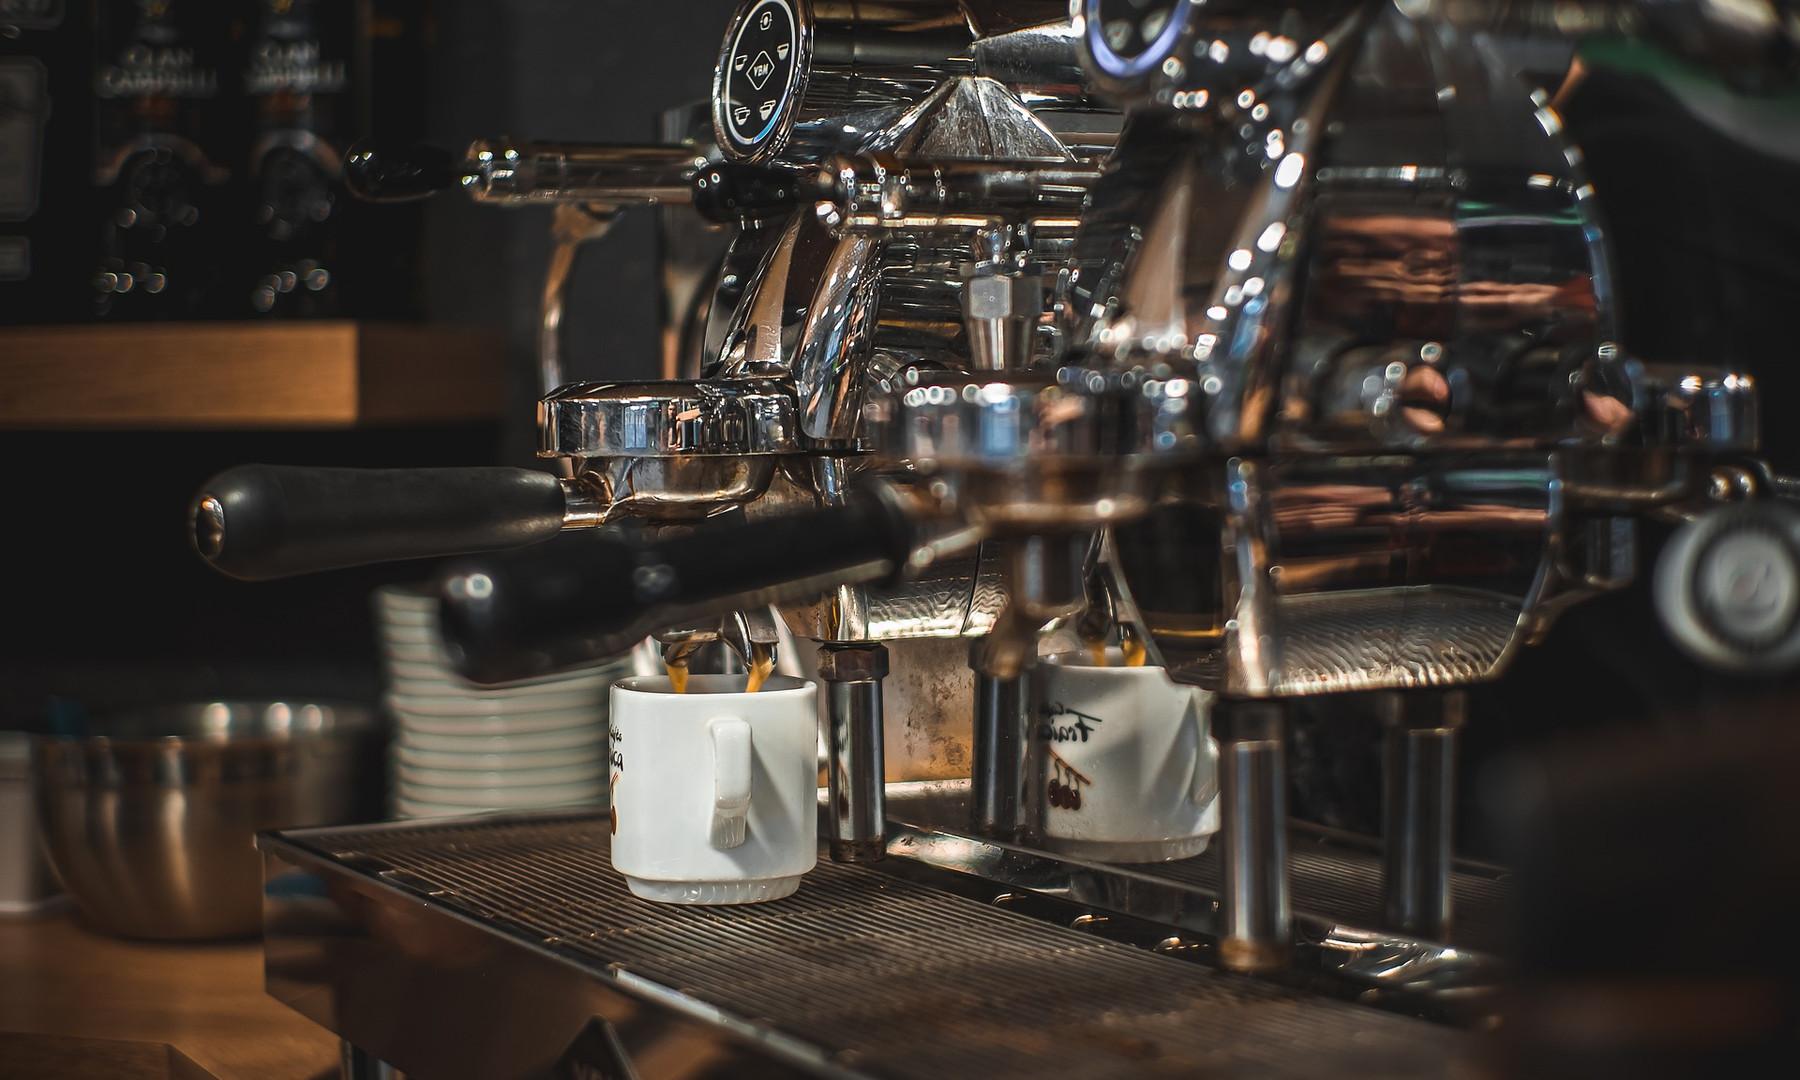 coffe-shop-4810584_1920.jpg